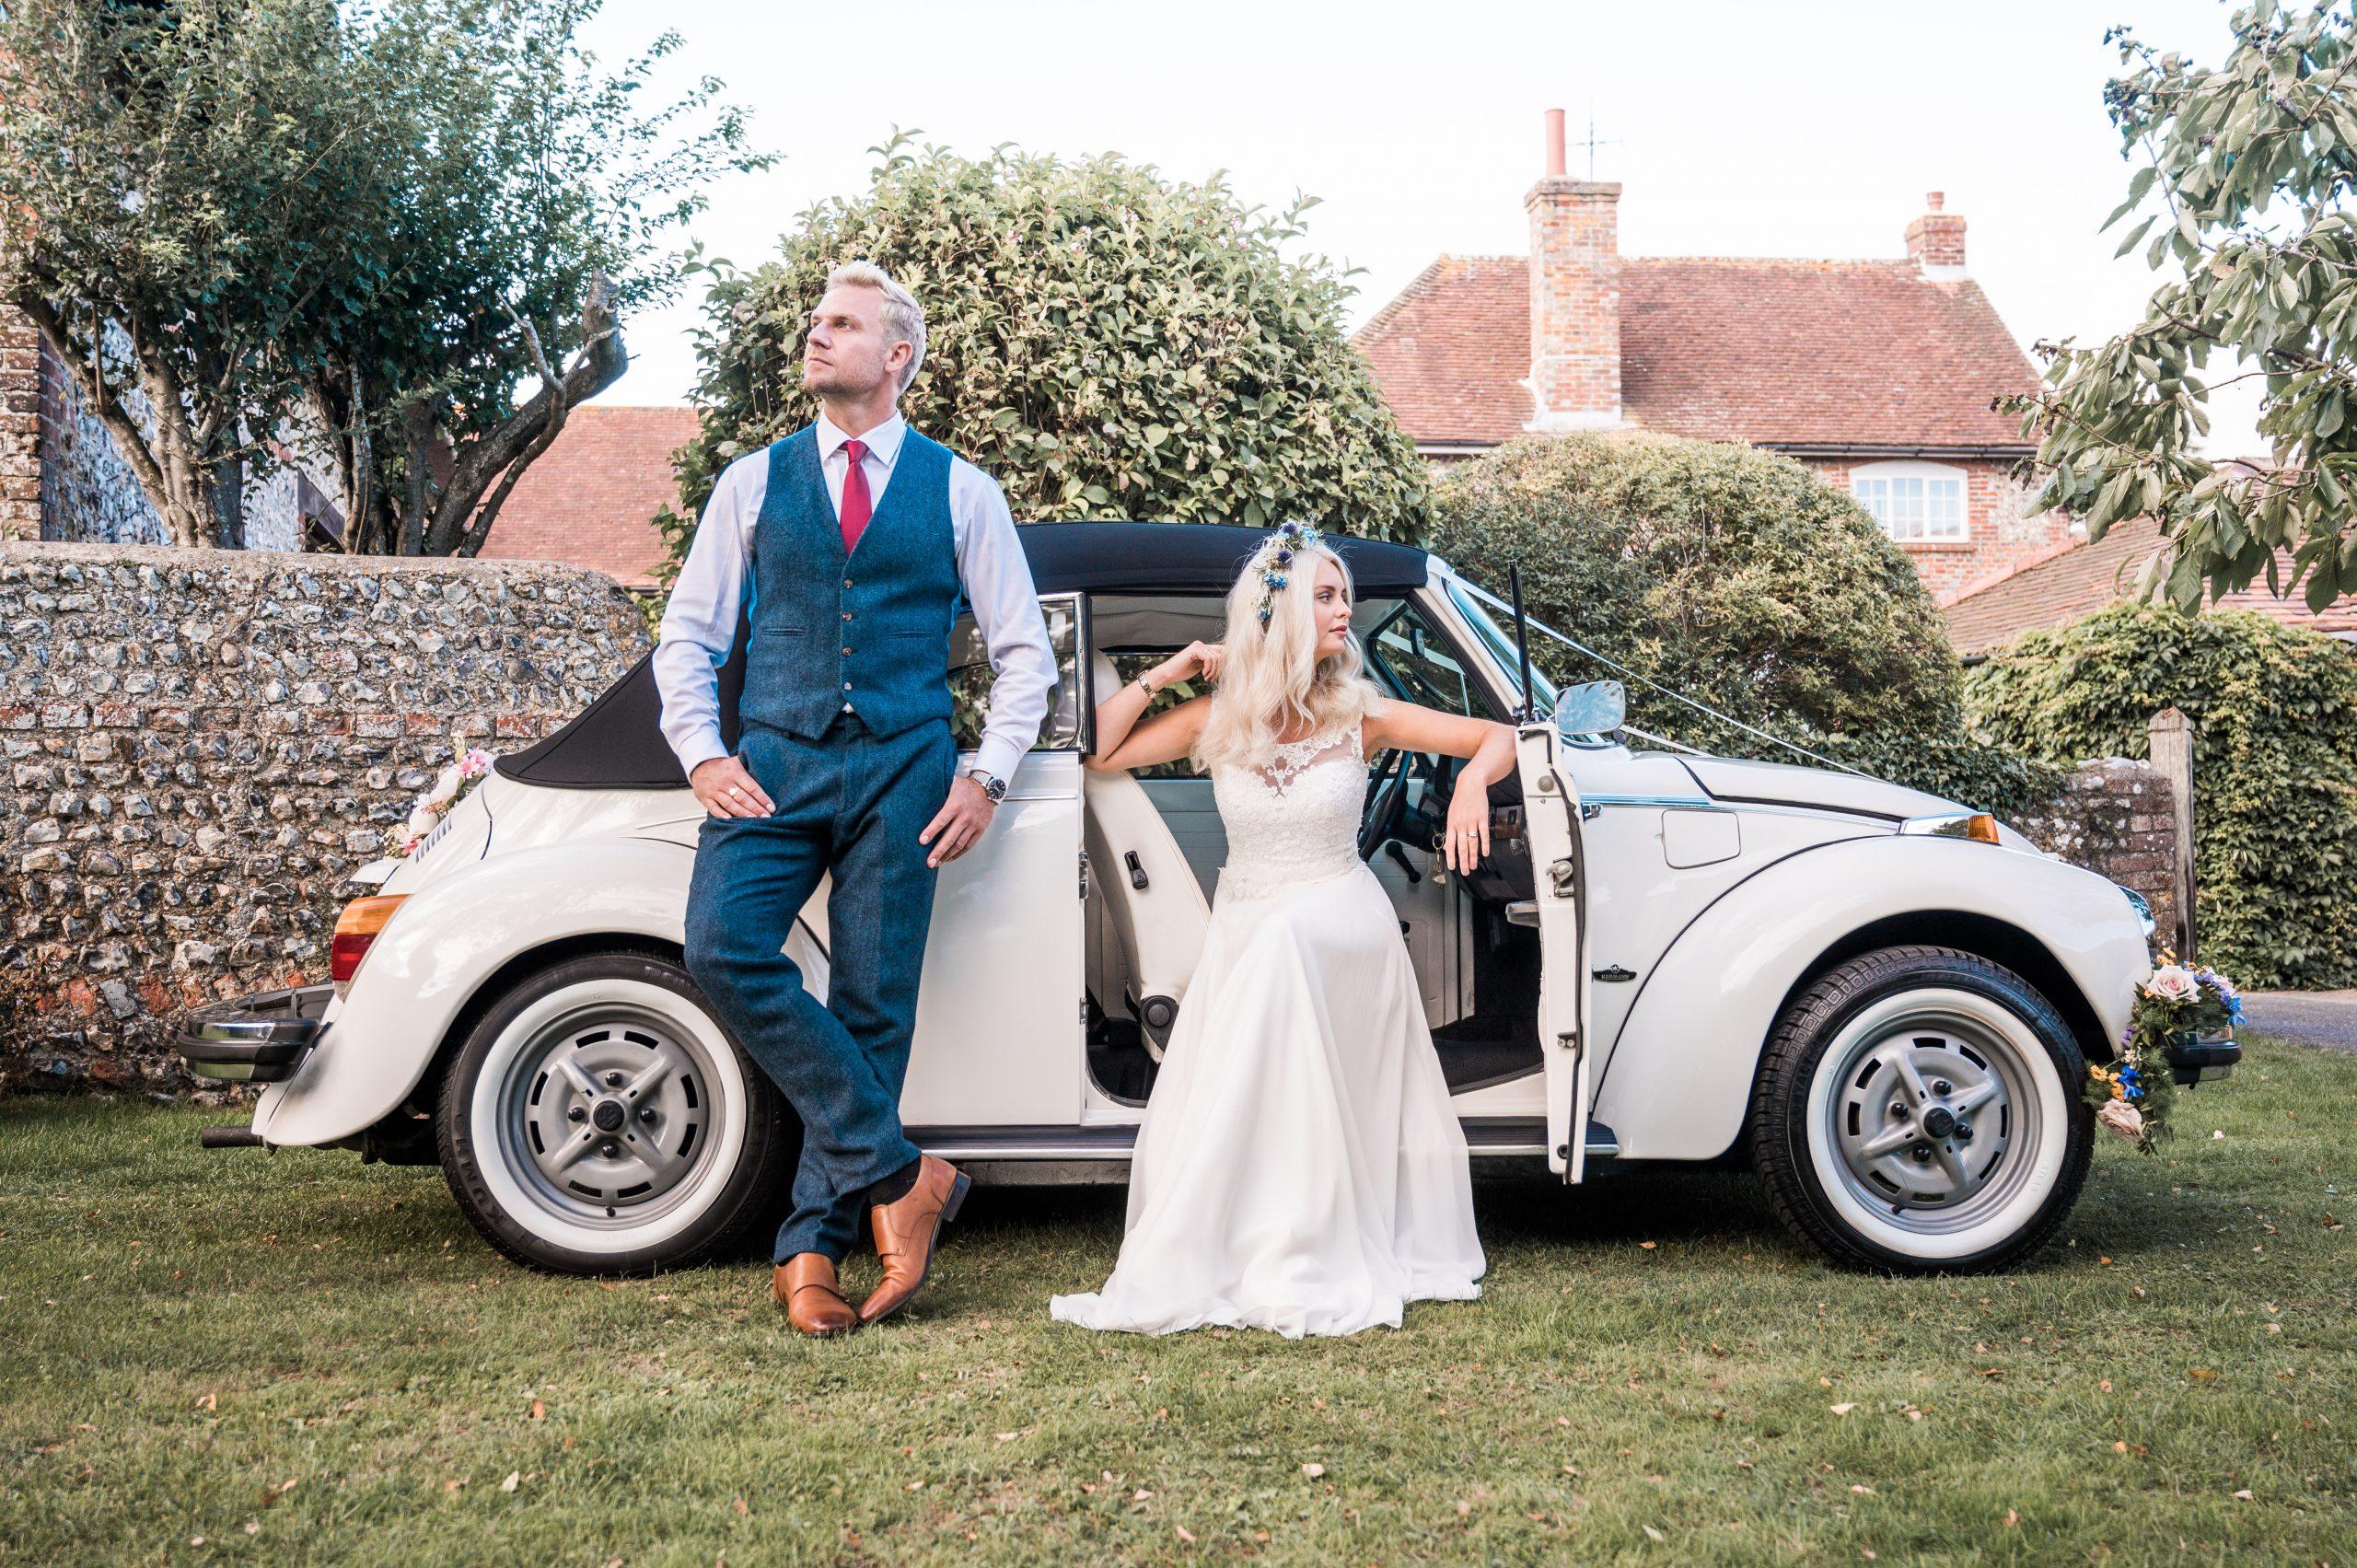 Something Blue Wedding Car Hire https://www.somethingblueweddingcarhire